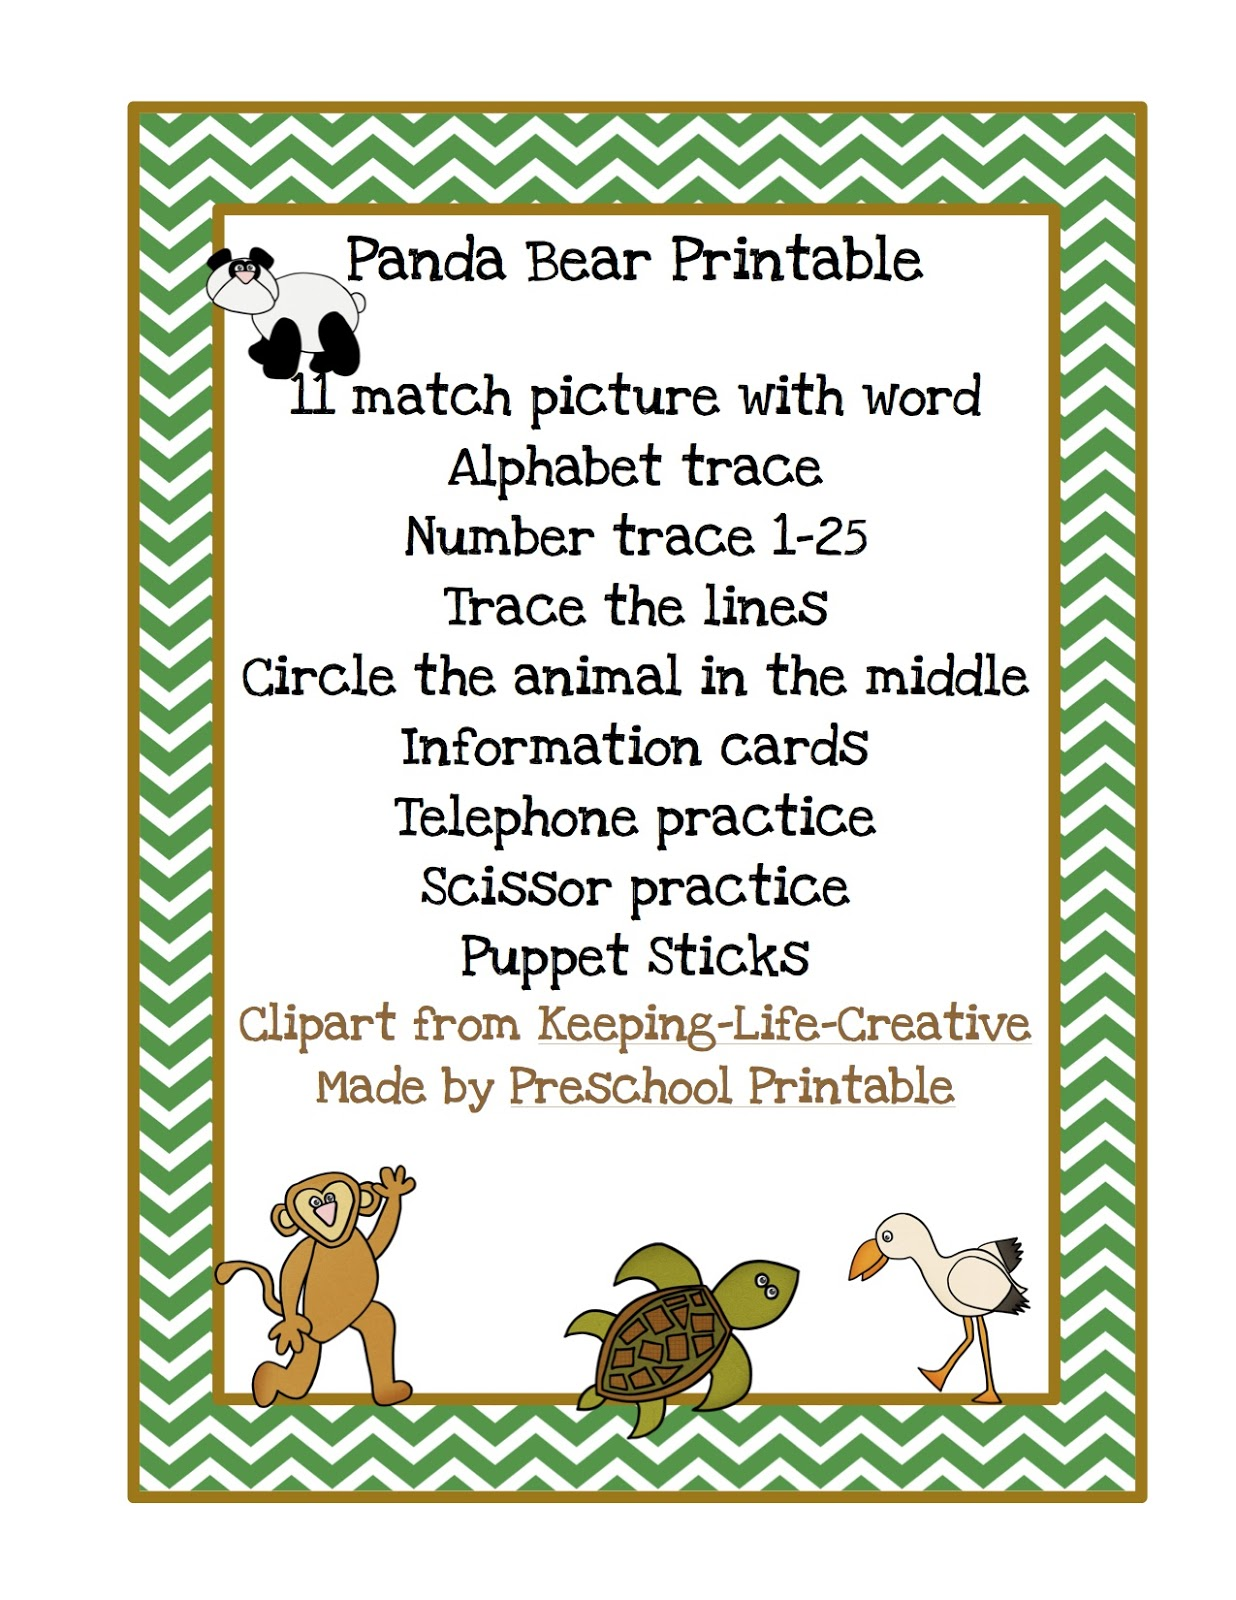 Panda Bear Printable Panda Bear Panda Bear What Do You